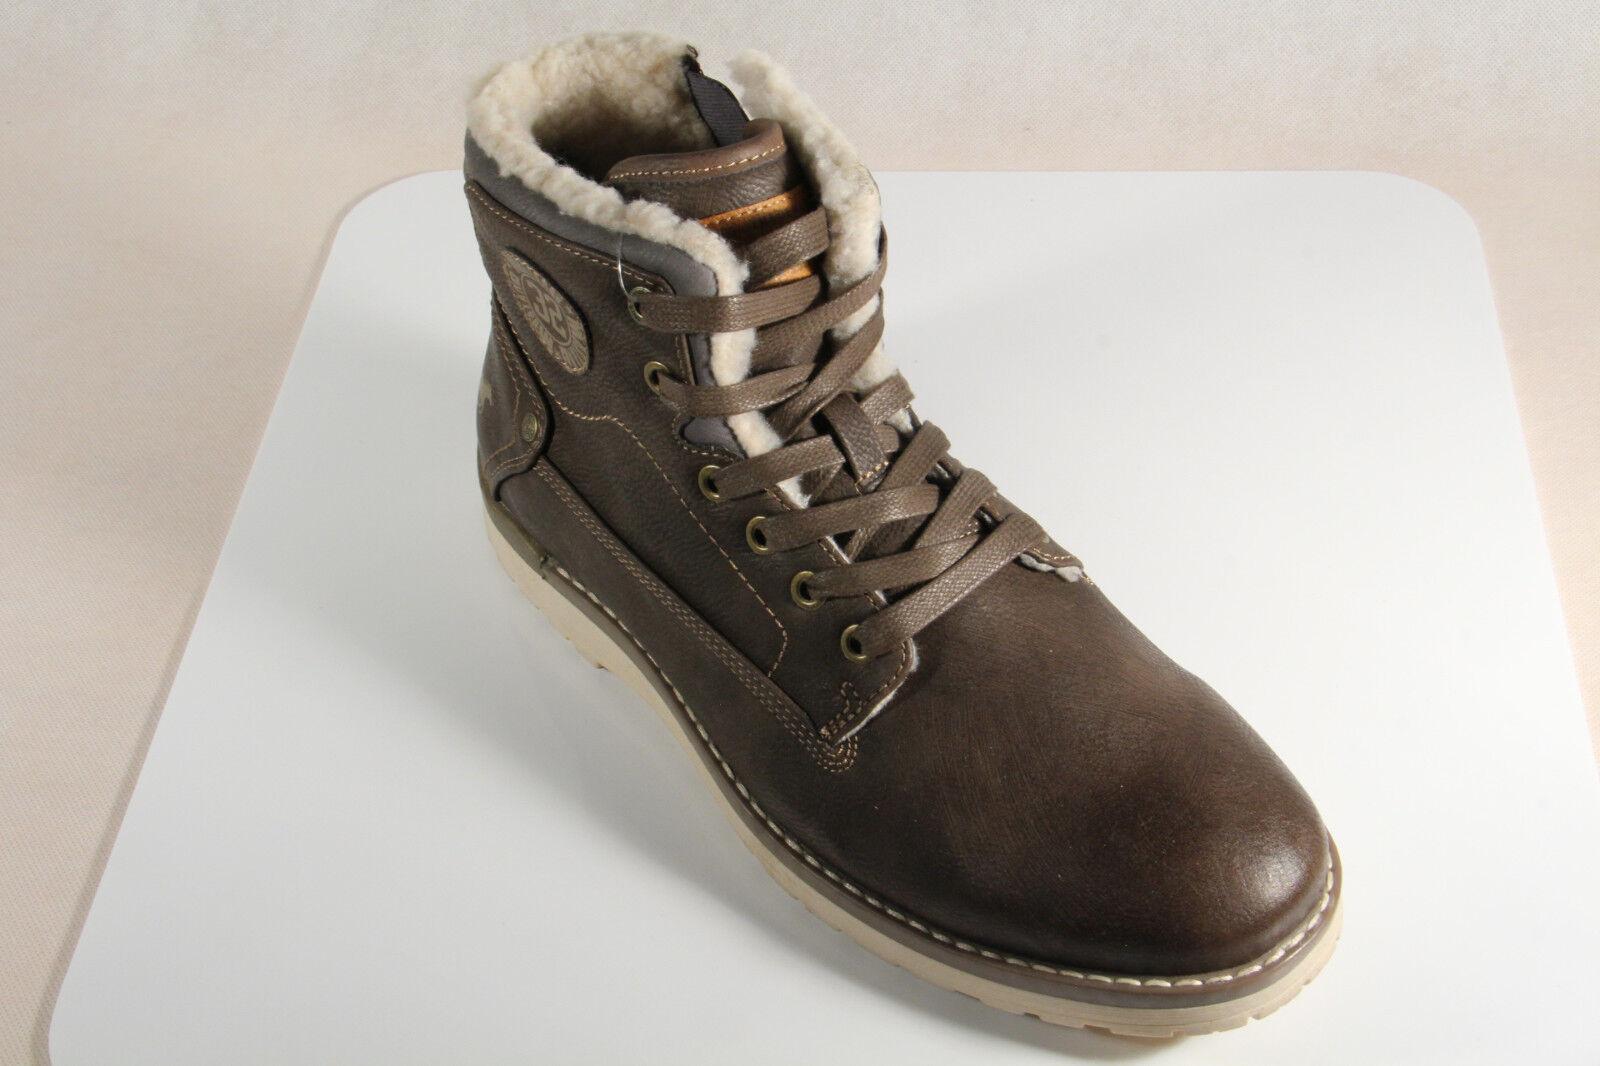 Mustang Stiefel Boots NEU Schnürstiefel Winterstiefel dunkelbraun 4092 NEU Boots ae5e86